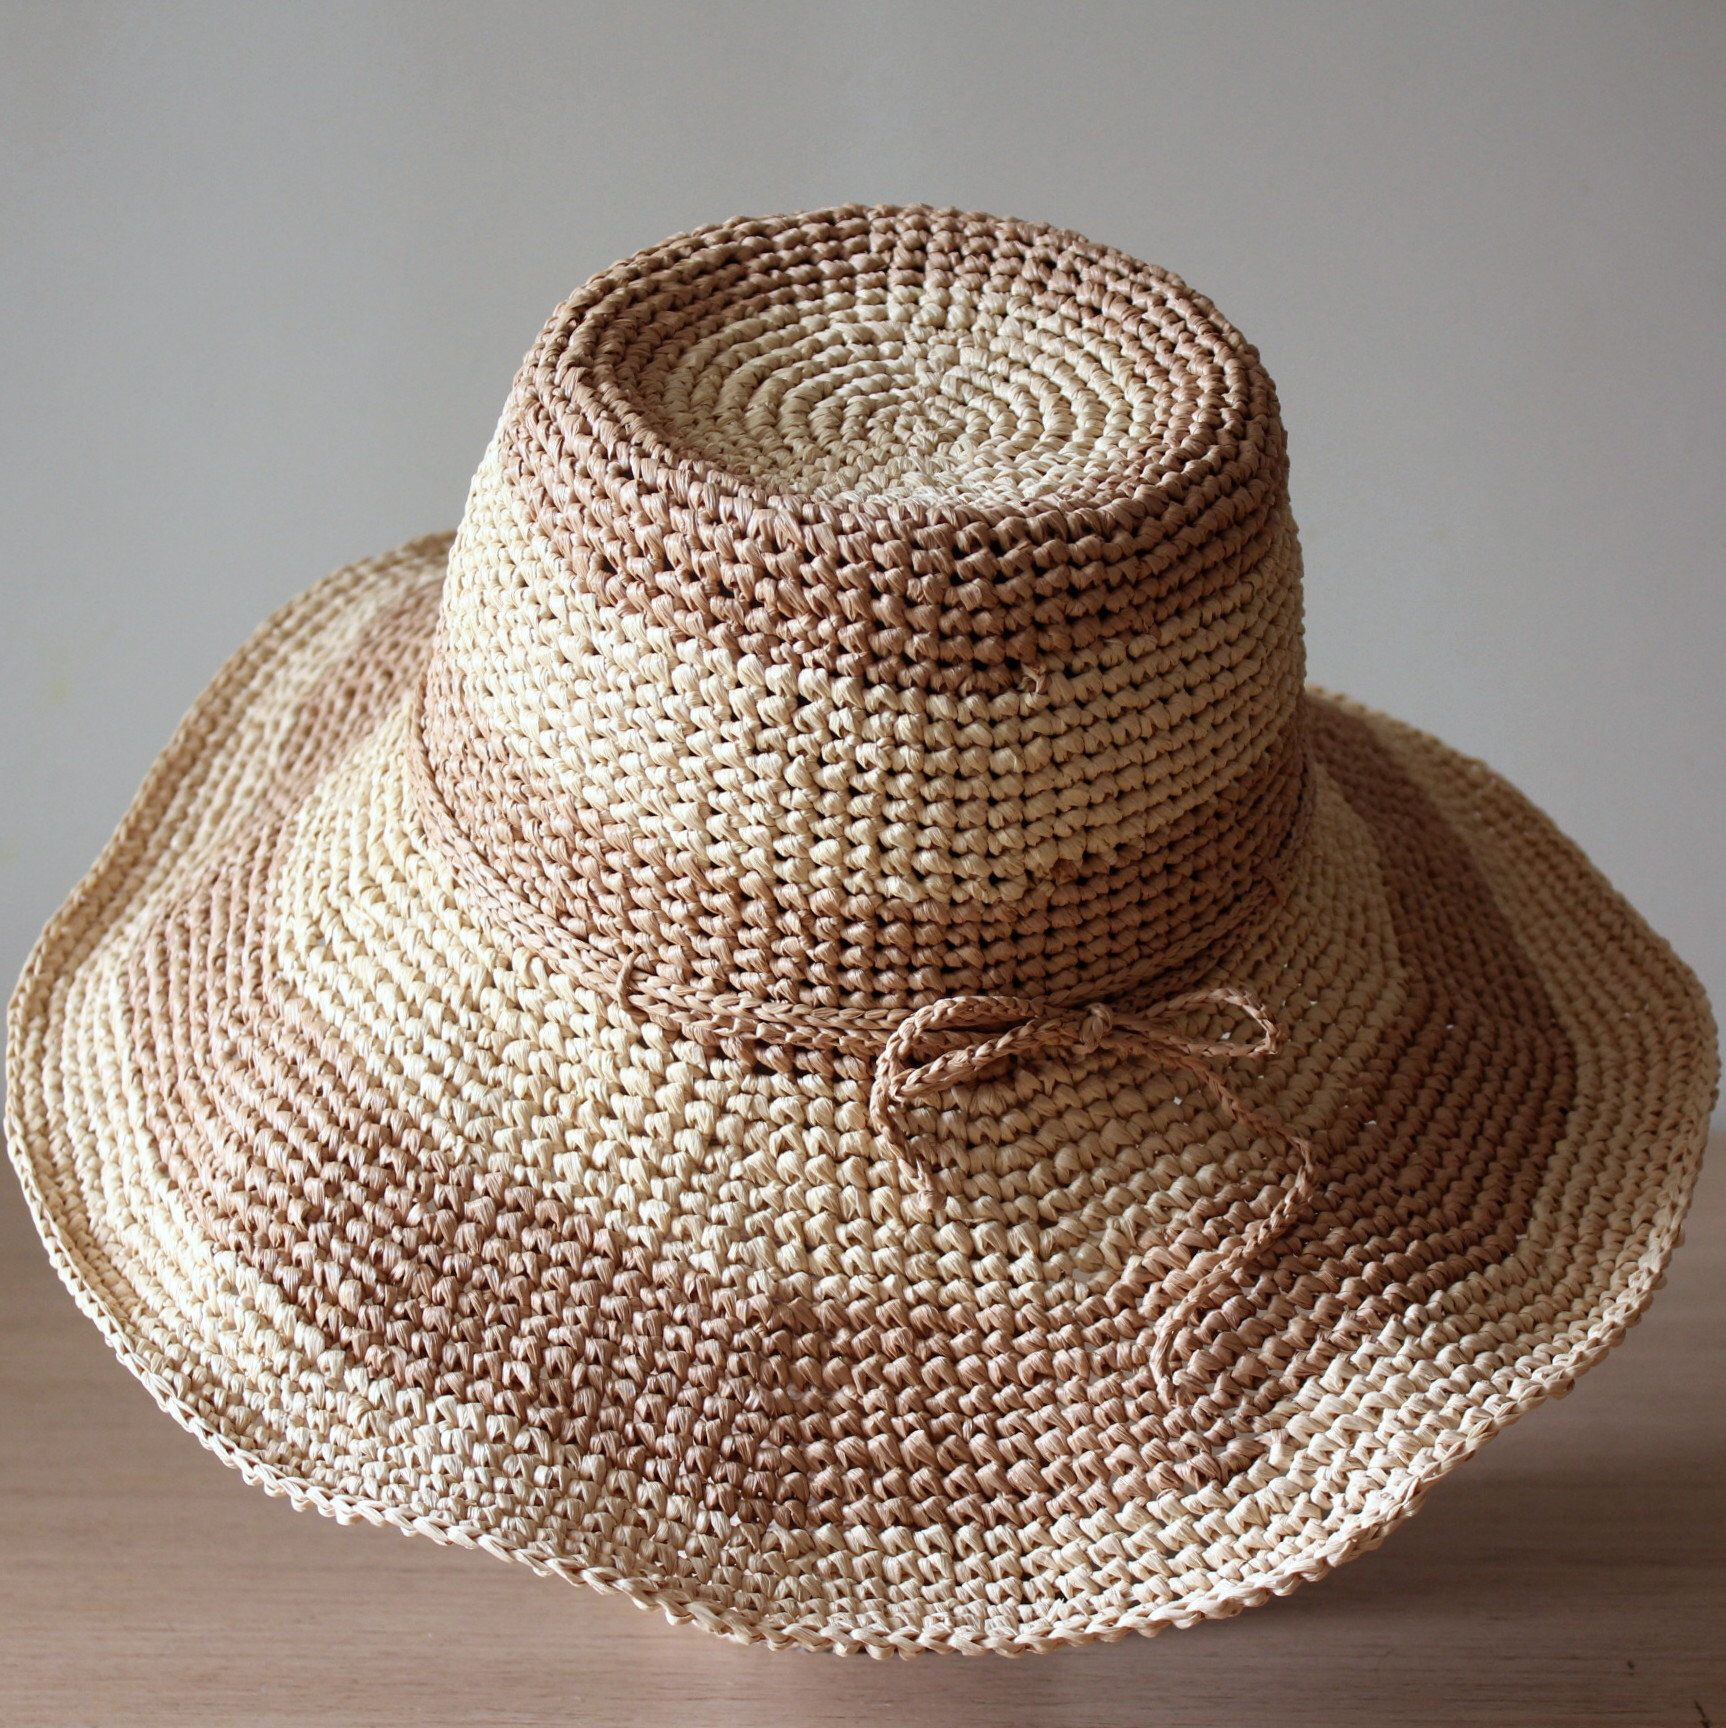 on feet at f39f0 77476 womens sun brim hat villagehatshop ... 4ff9b39c4e6